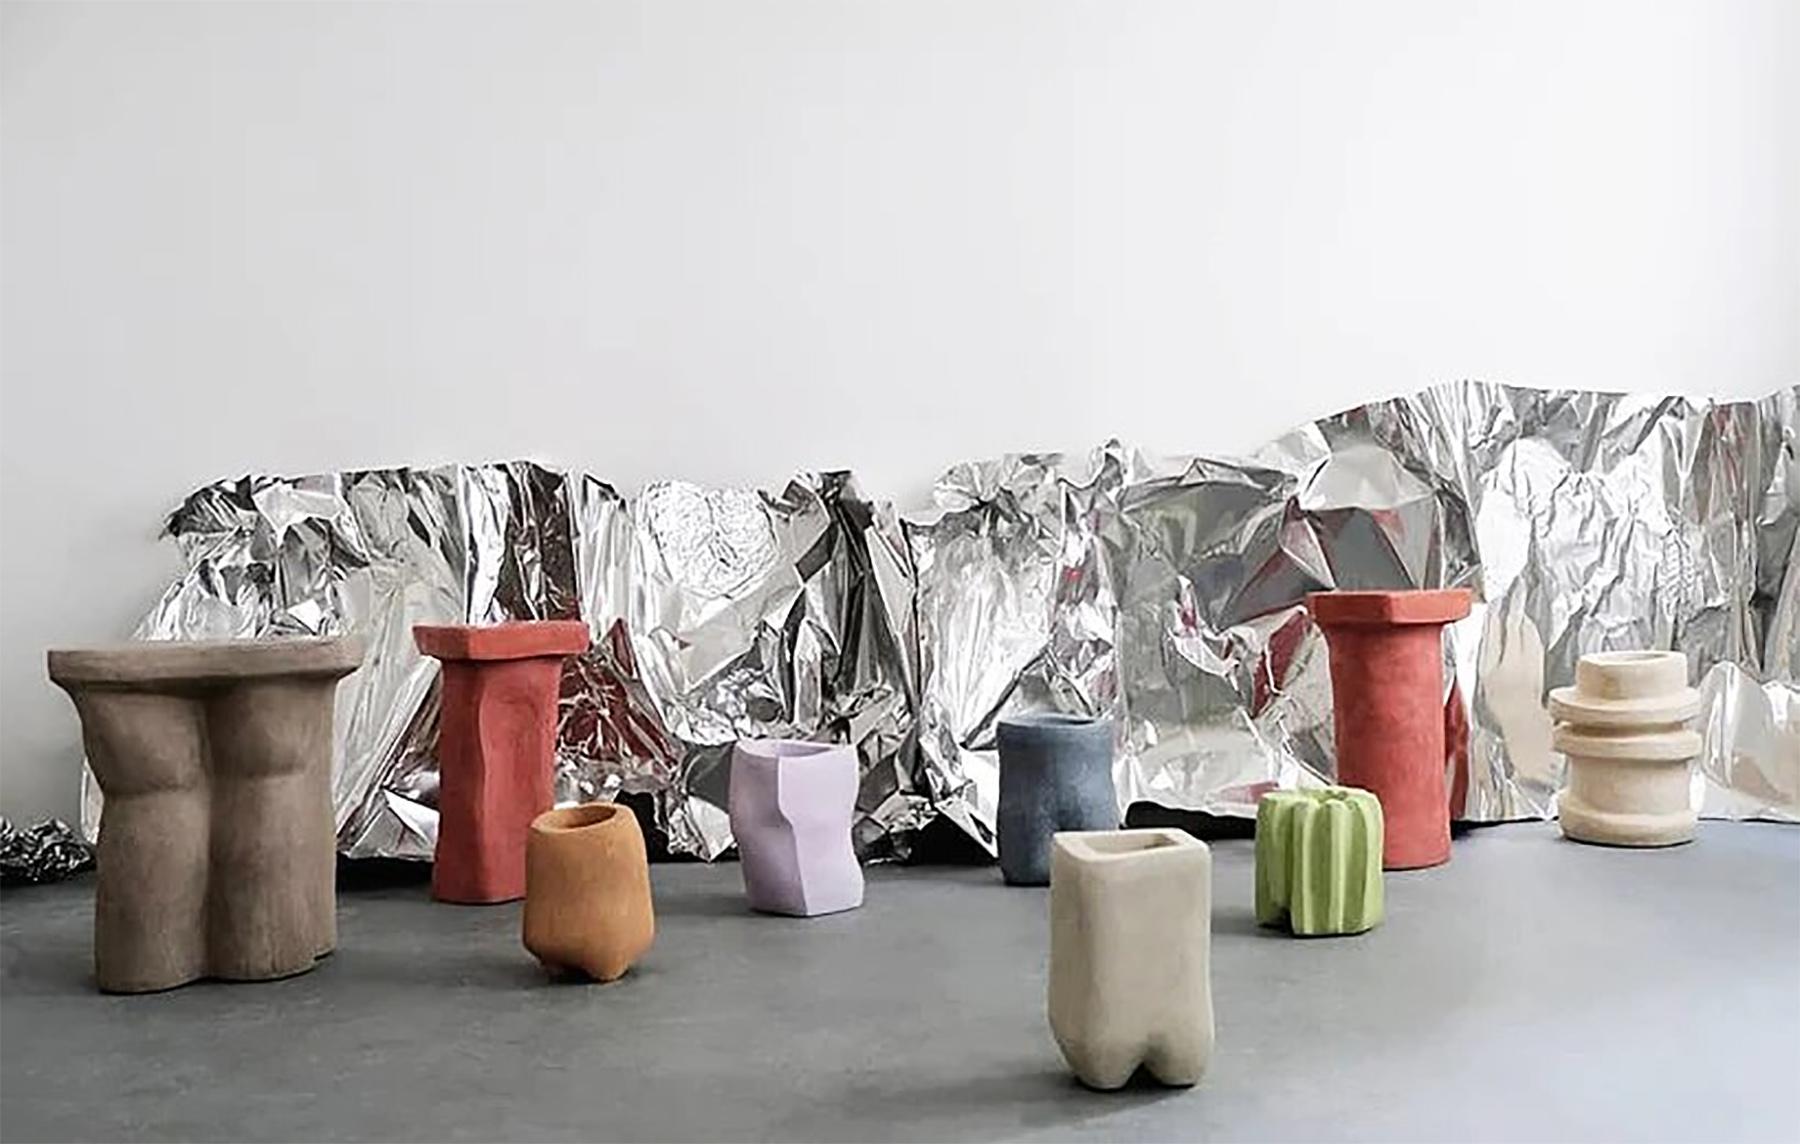 Hemp plant pots